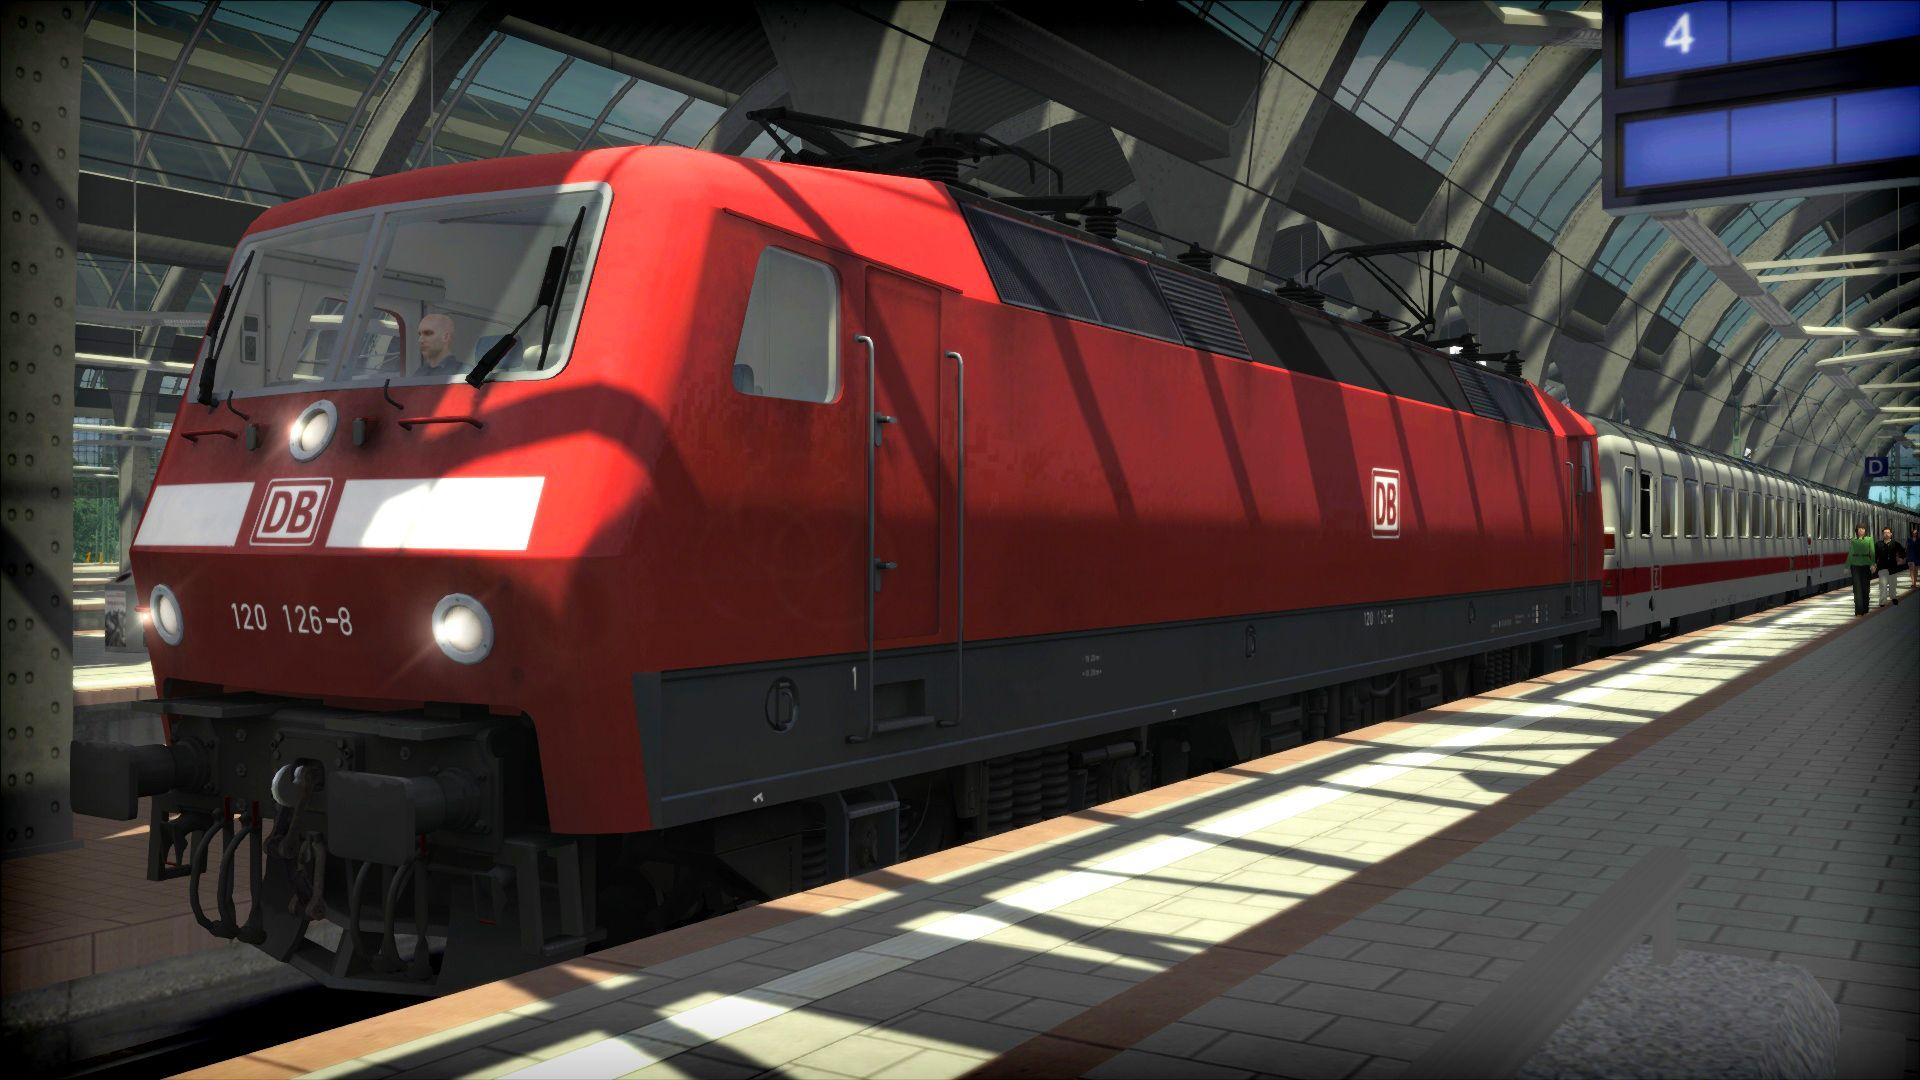 BR1205